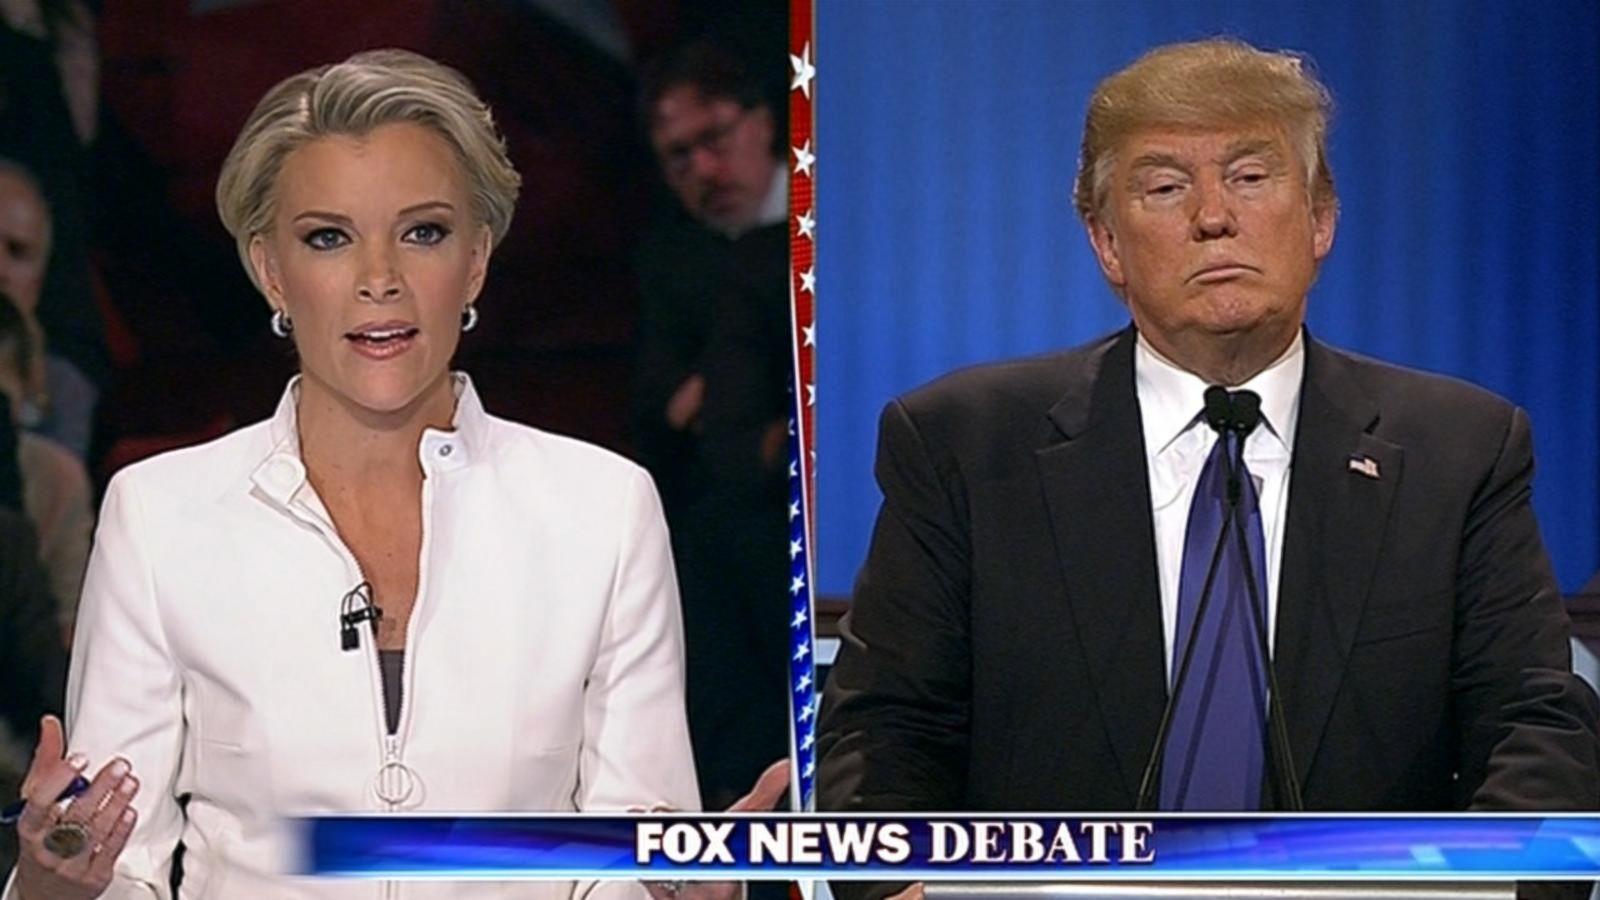 A History of the Donald Trump-Megyn Kelly Feud - ABC News